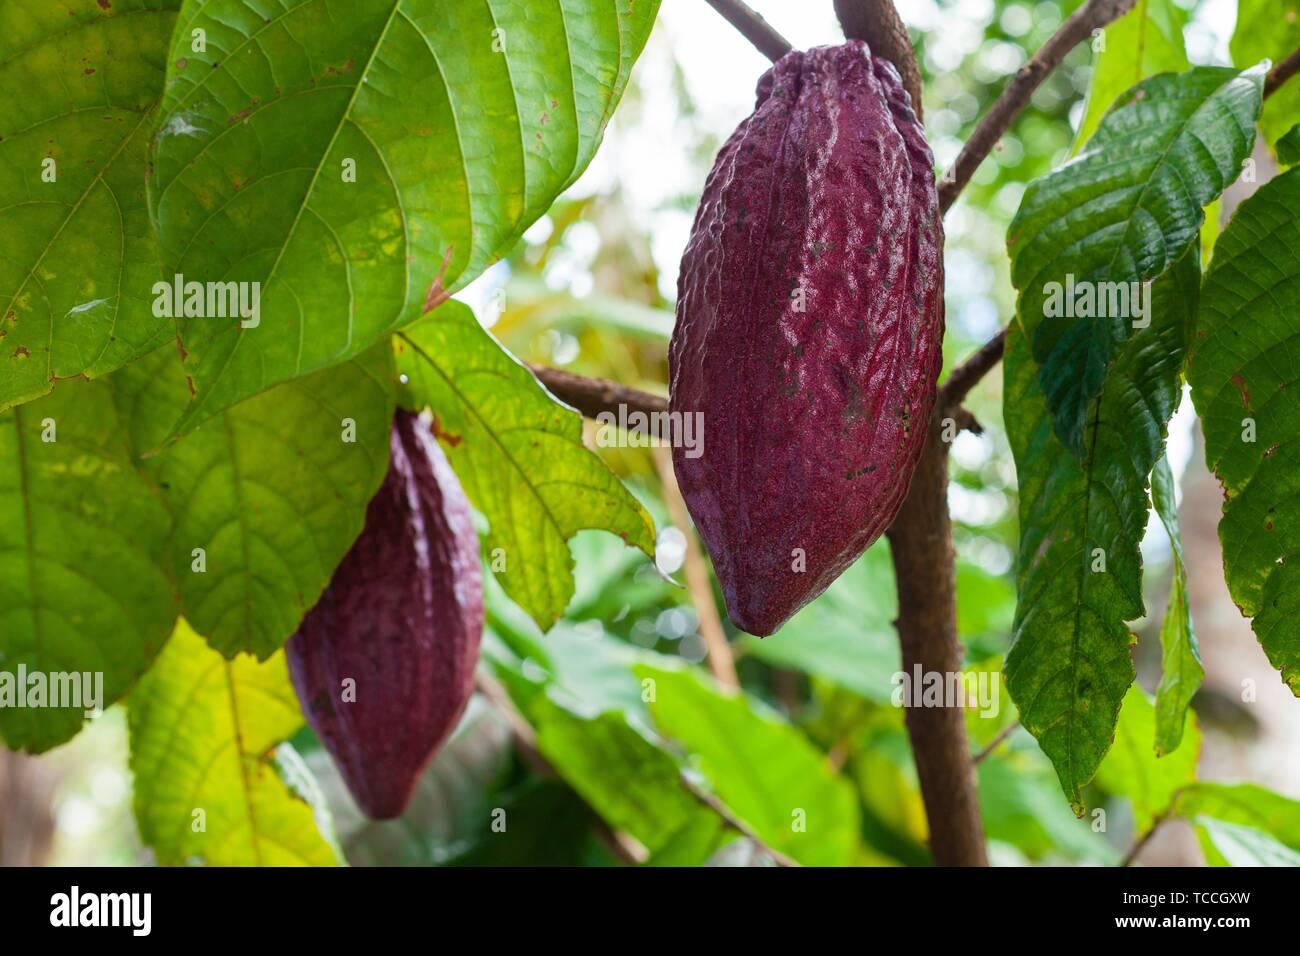 Trinitario cocoa (Theobroma cacao) pods on Sumatra, Indonesia. Stock Photo